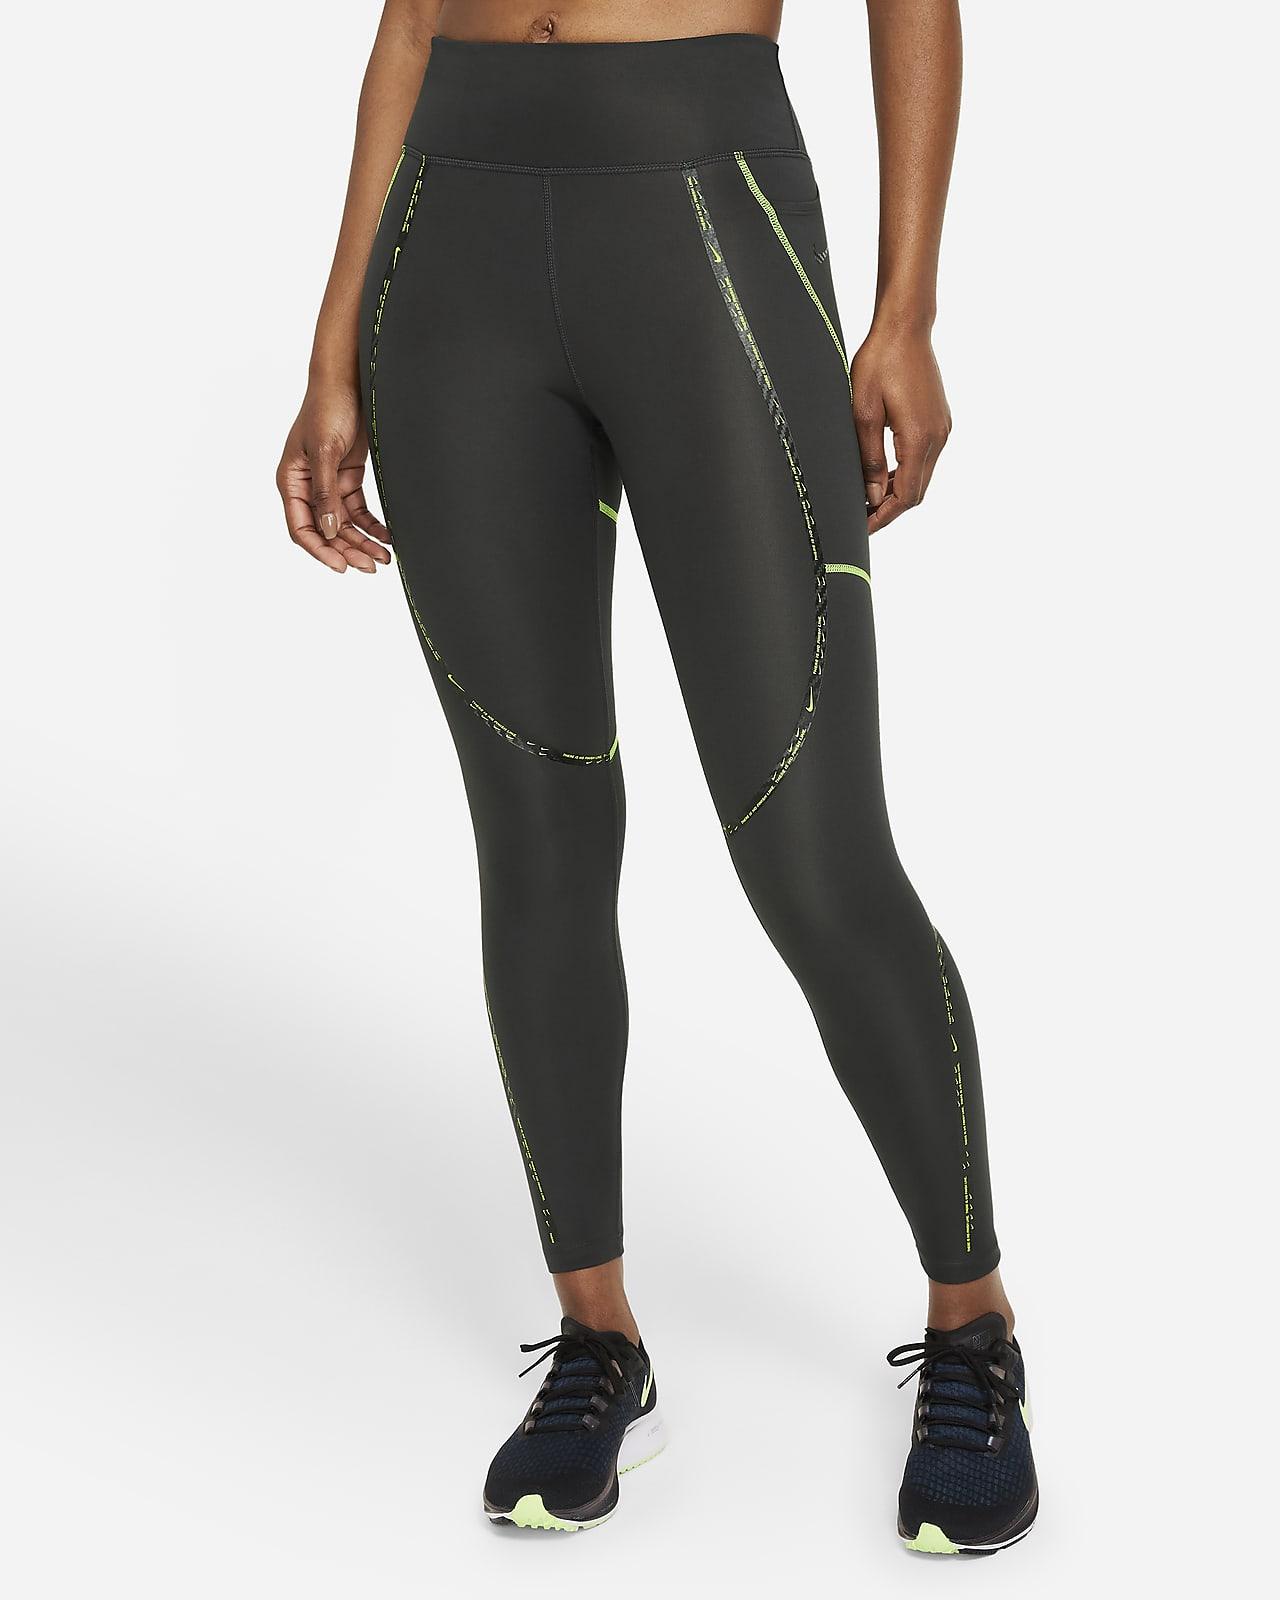 Nike Epic Faster Women's Mid-Rise 7/8 Taped Running Leggings